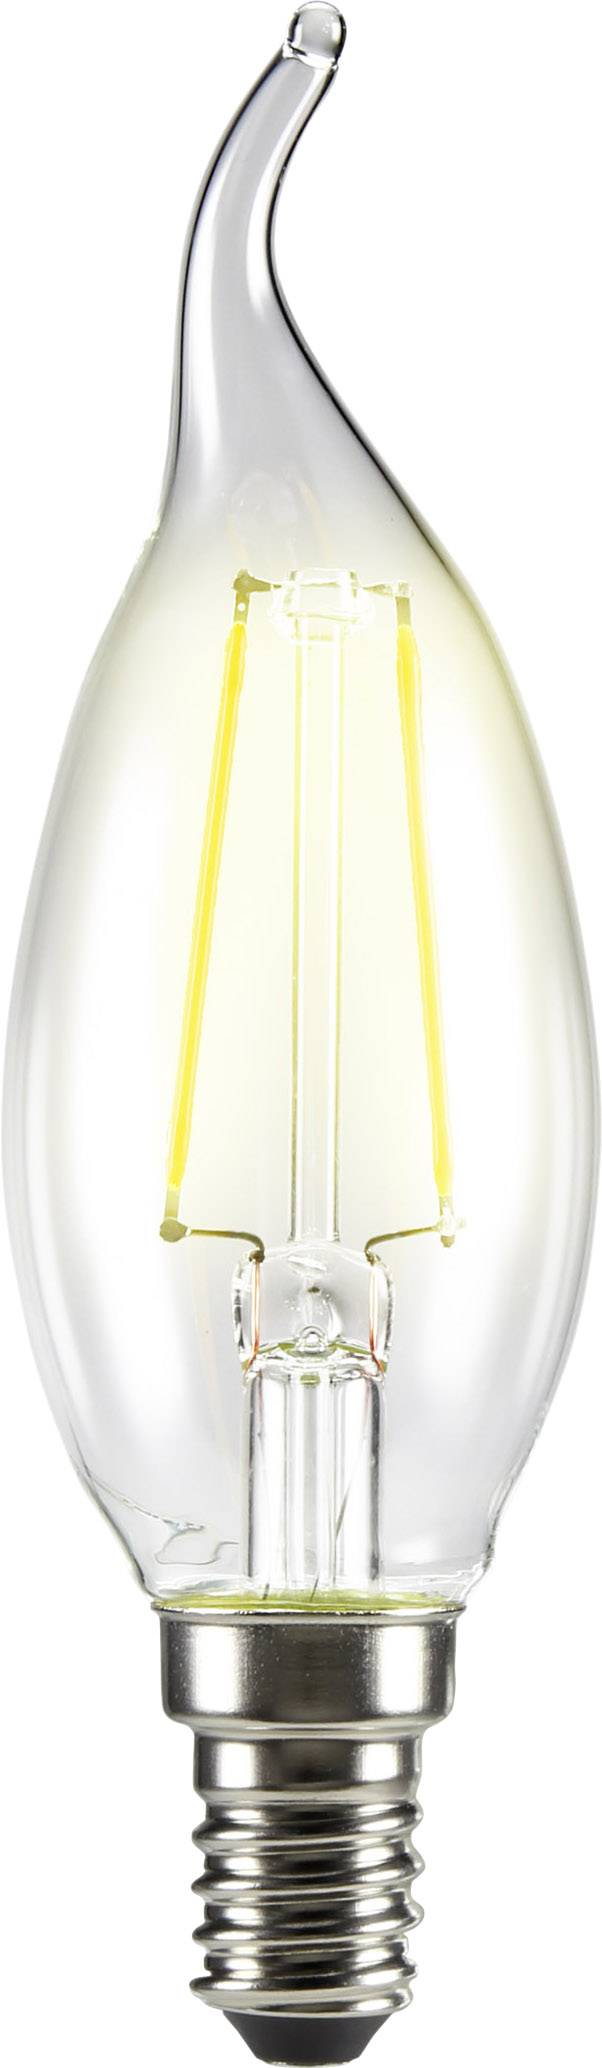 LED žiarovka 120 mm sygonix 230 V 4 W = 37 W vlákno 1 ks